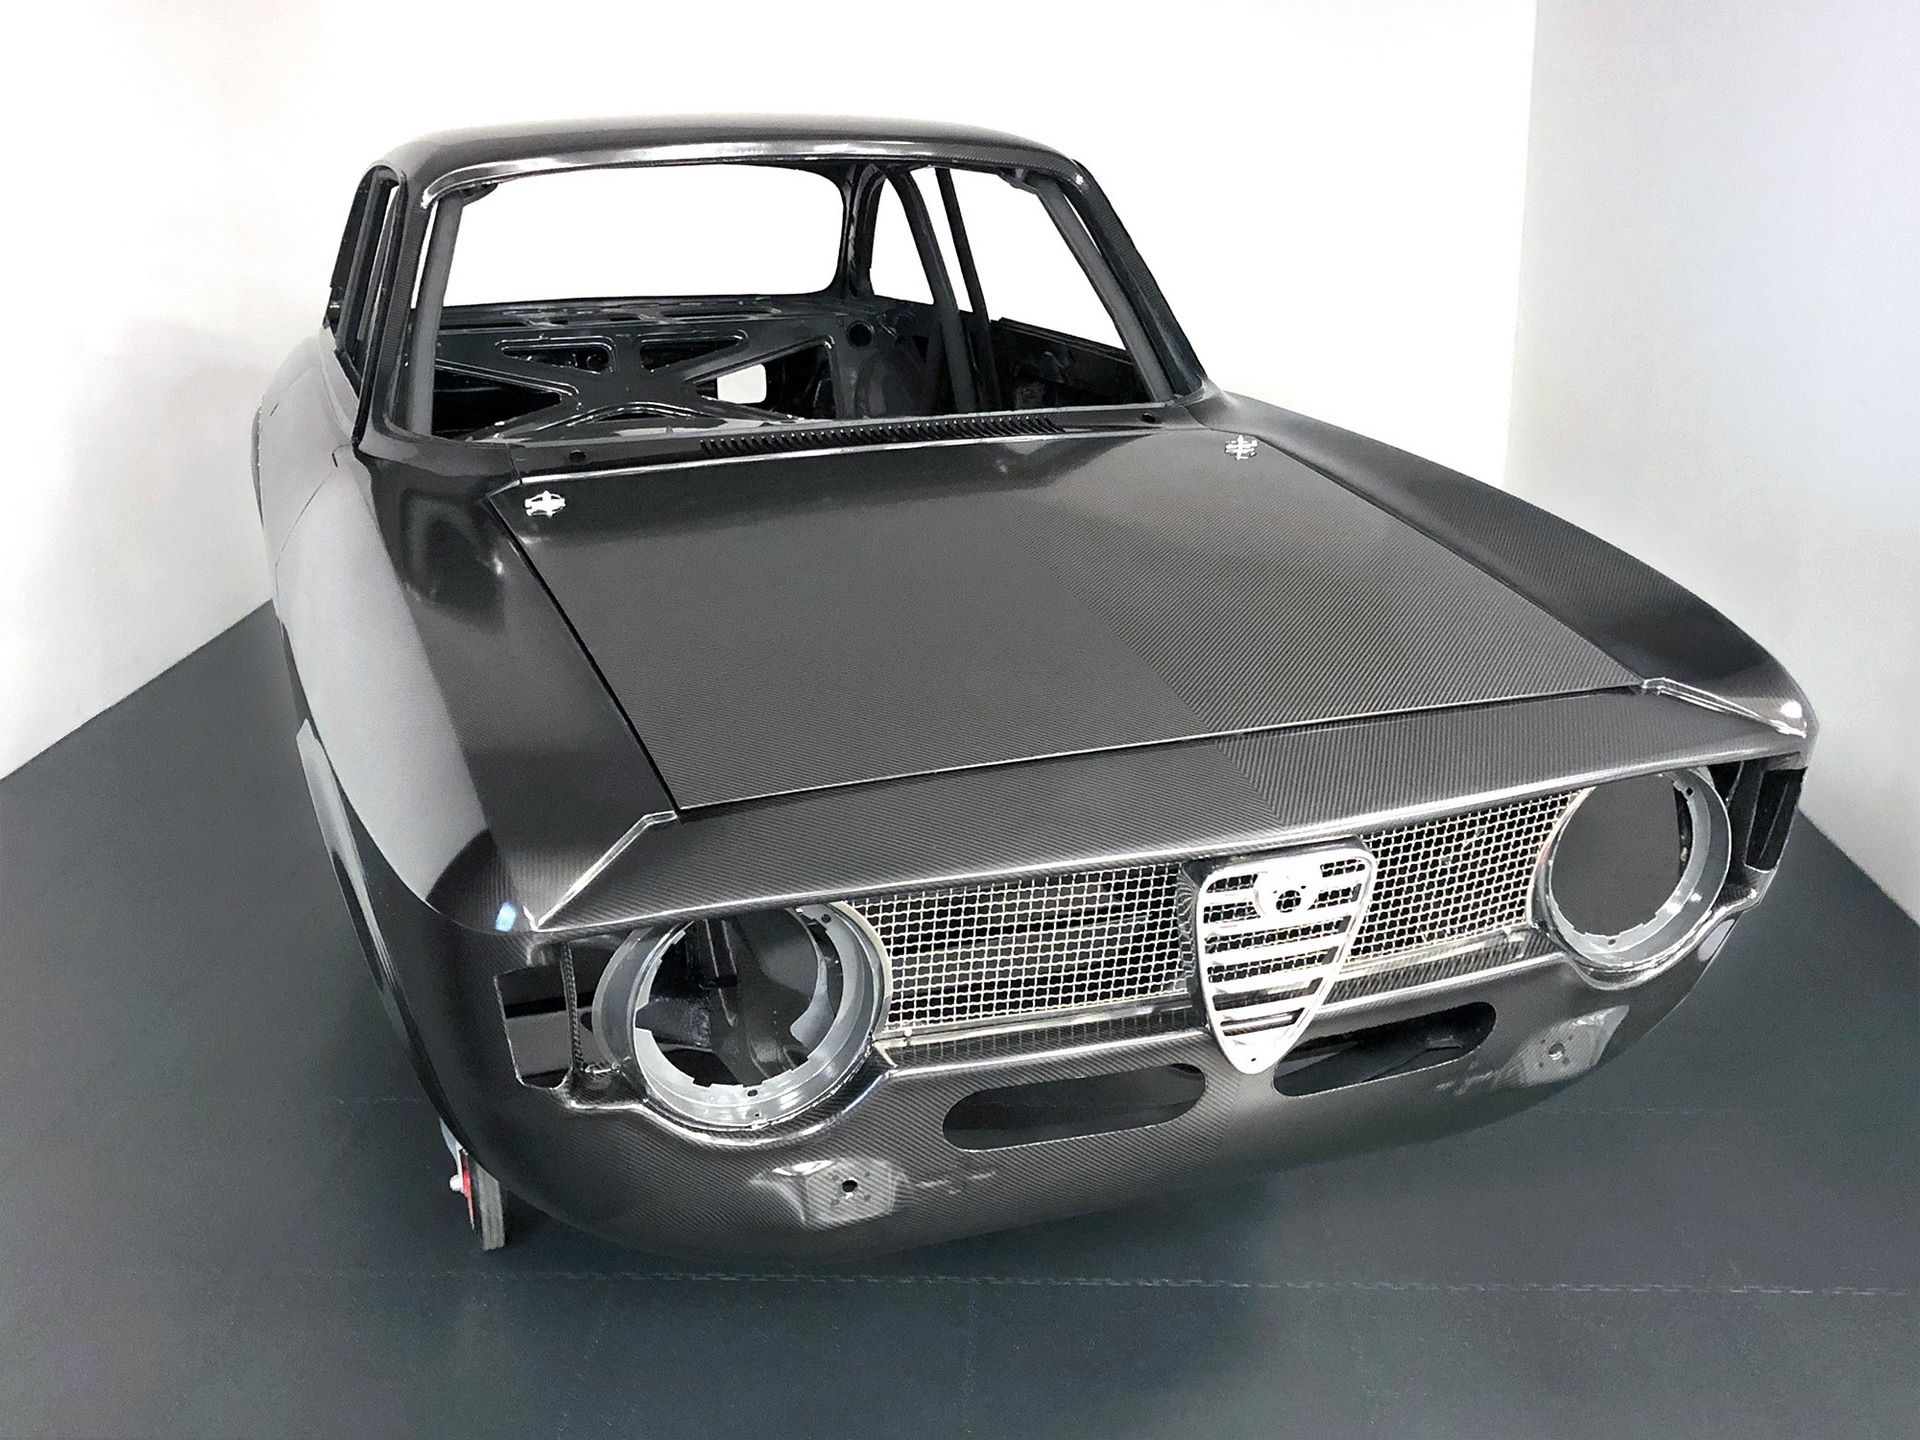 Carbon-Alfa-Romeo-Giulia-by-Alfaholics-1